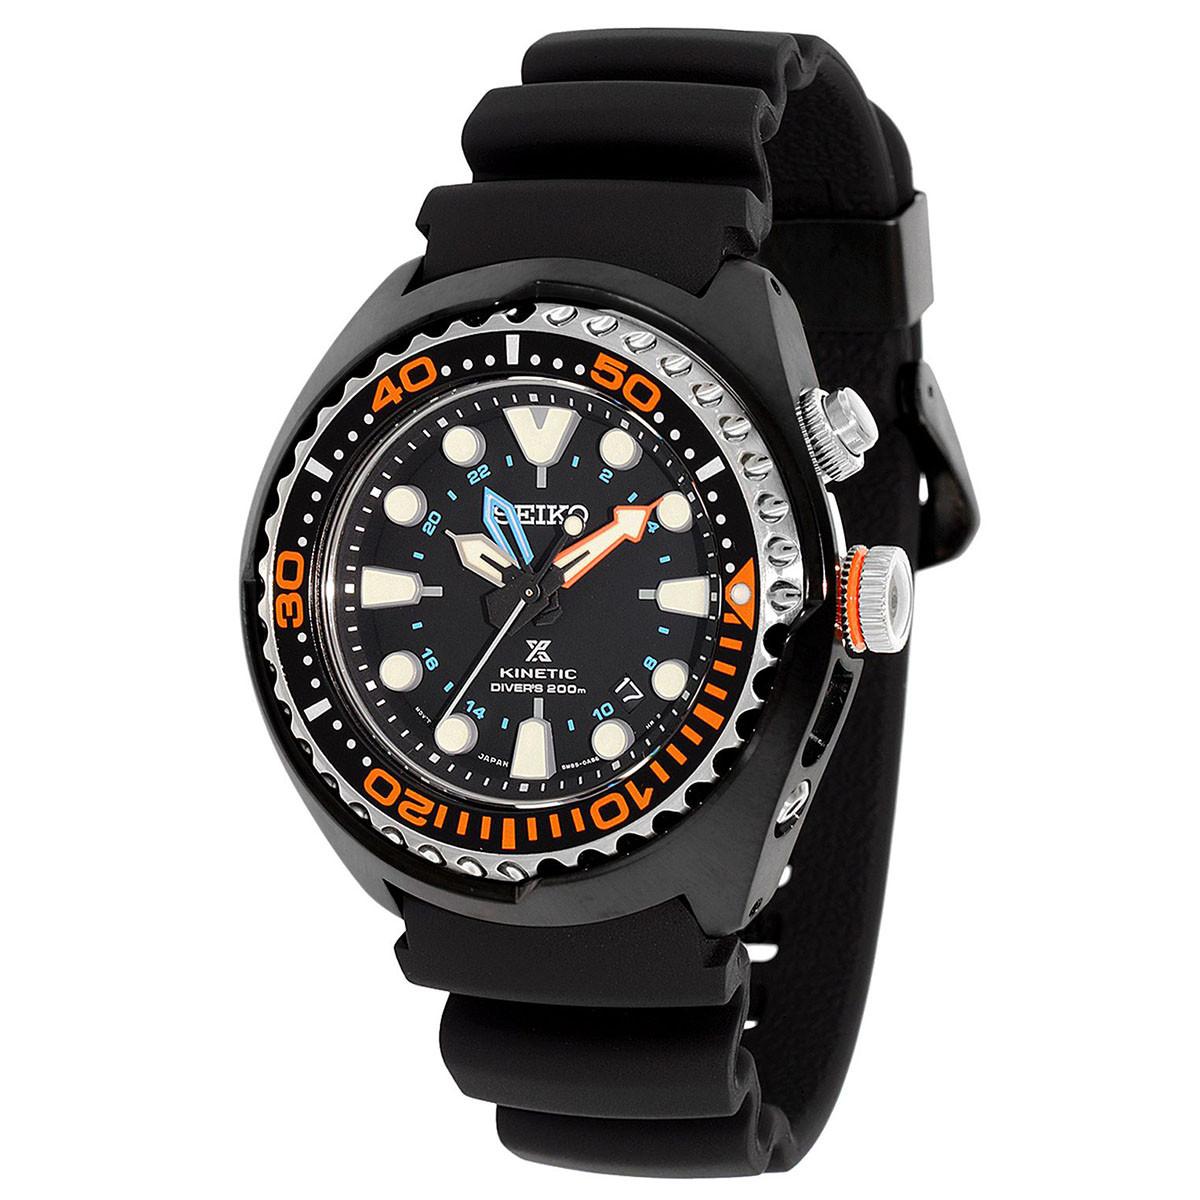 Часы Seiko SUN023P1 Prospex Kinetic Diver's